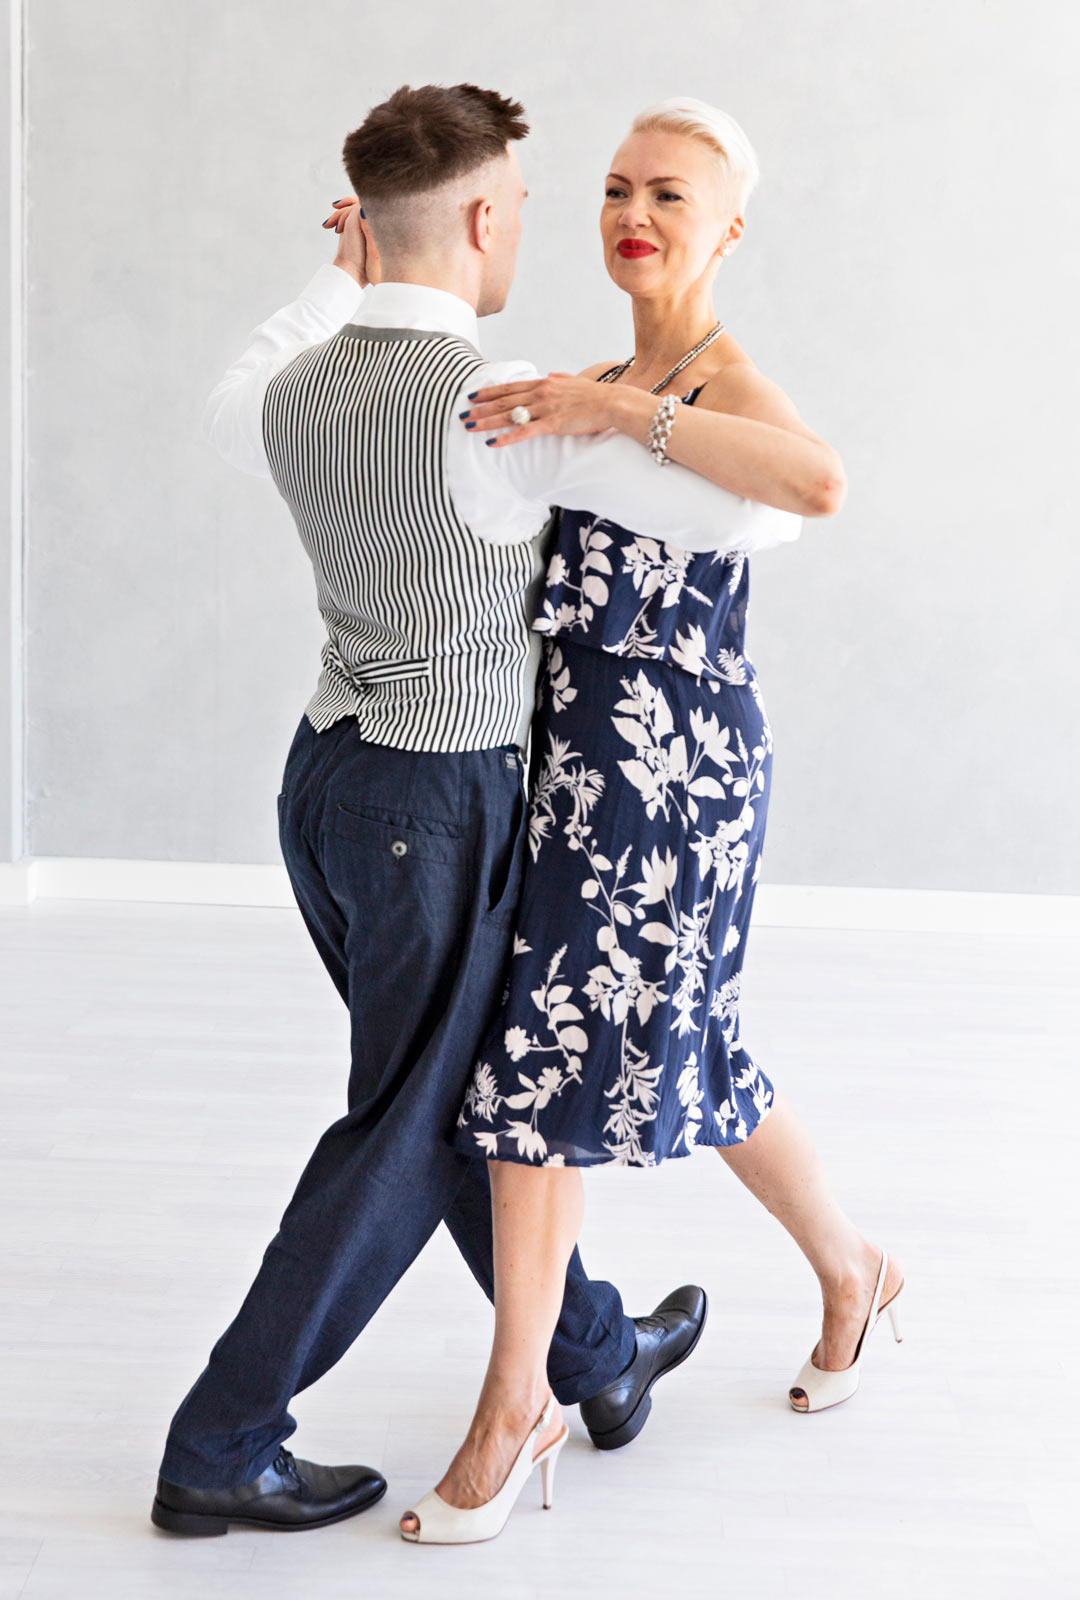 Ensimmäinen askel, tango